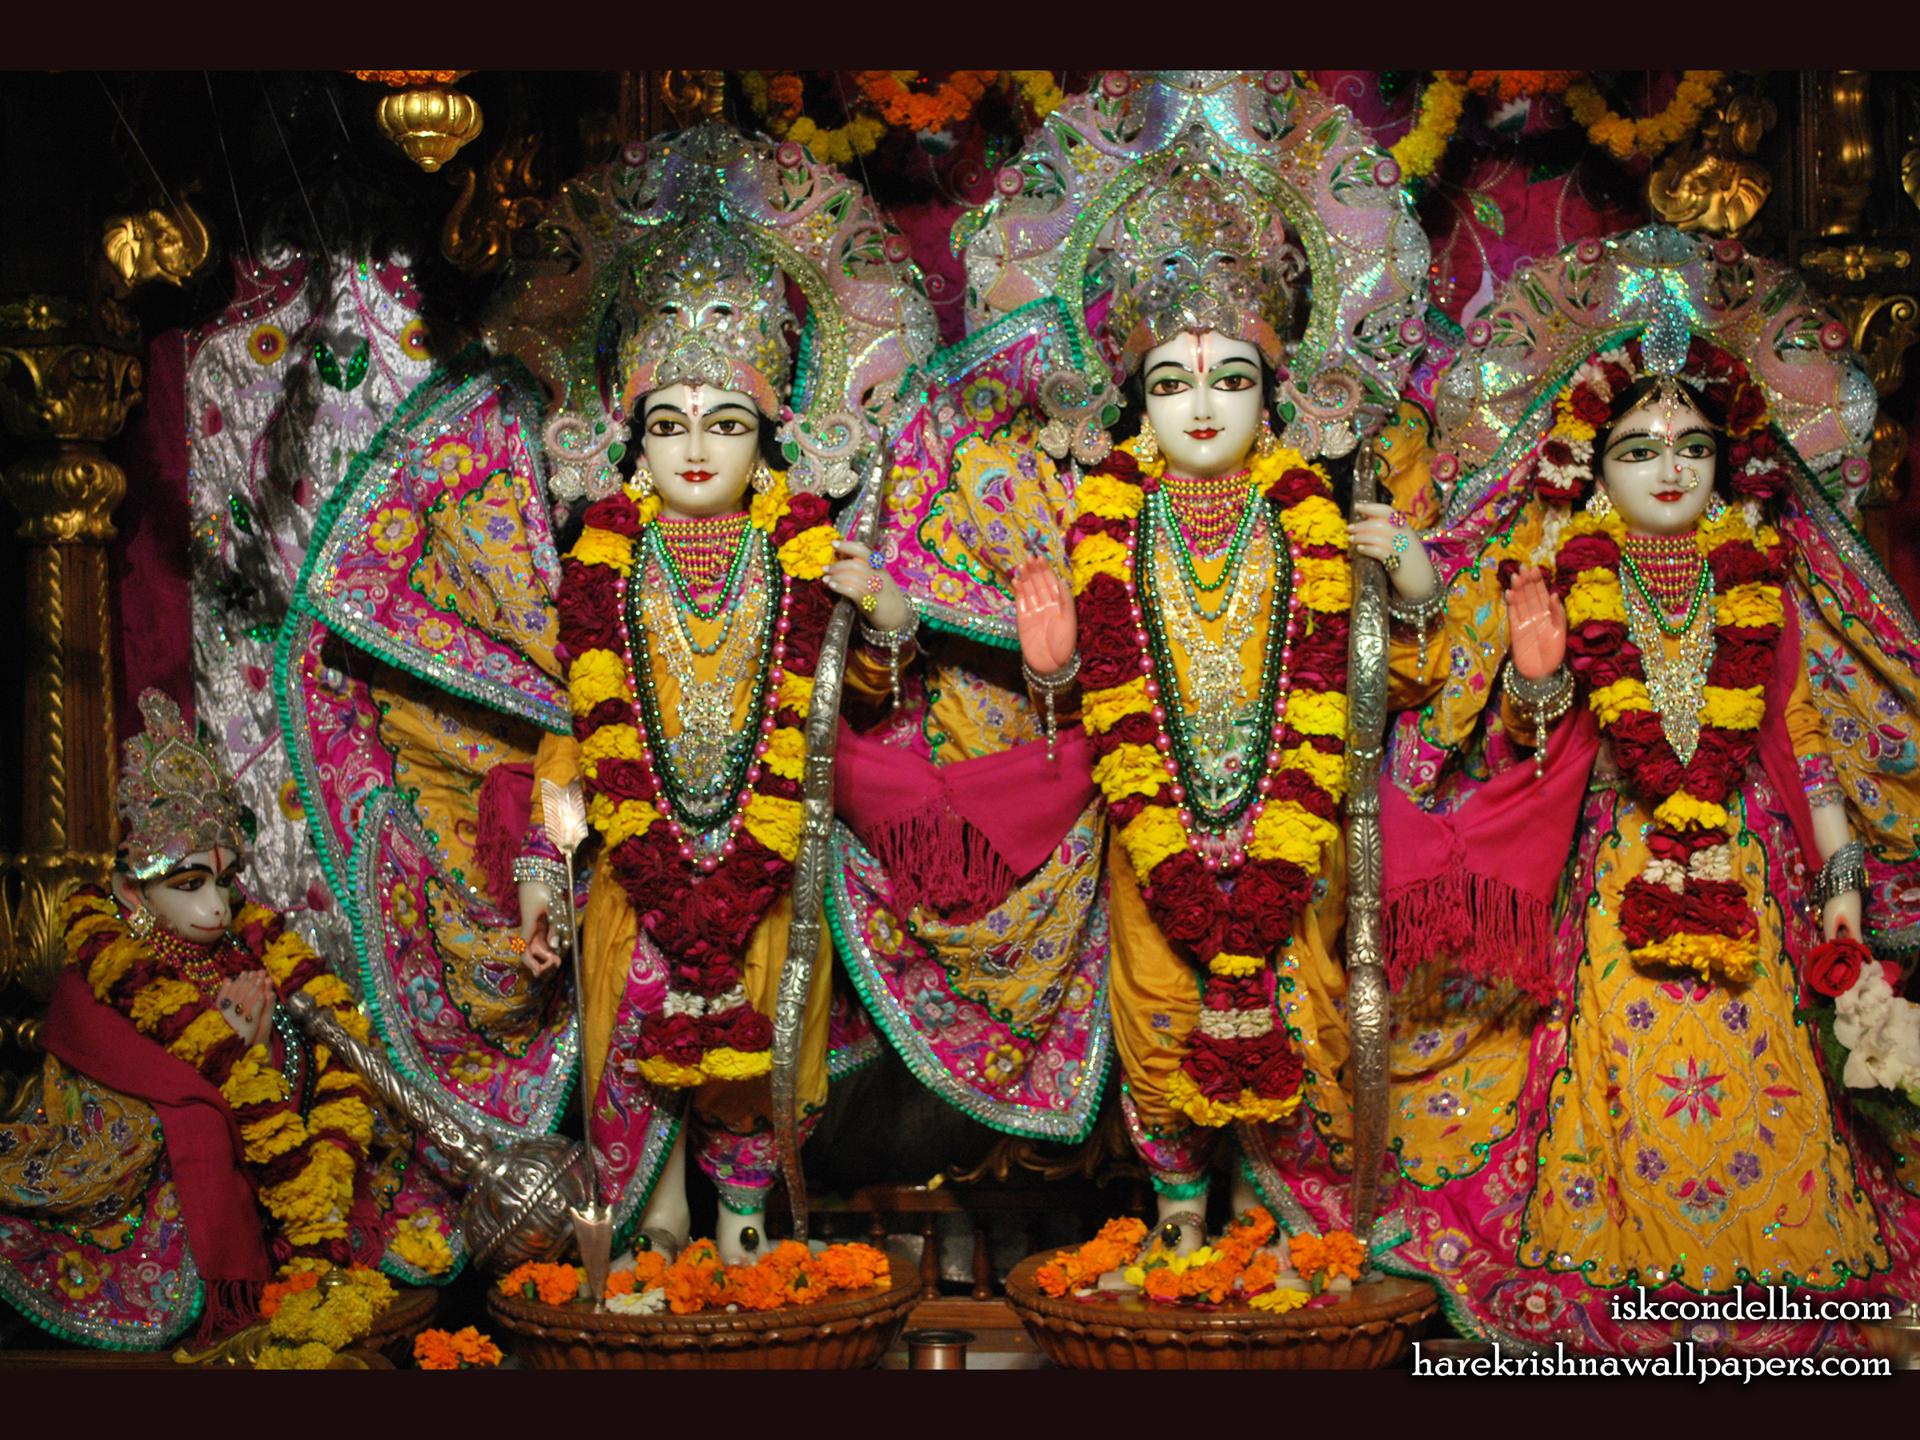 Sri Sri Sita Rama Laxman Hanuman Wallpaper (002) Size 1920x1440 Download